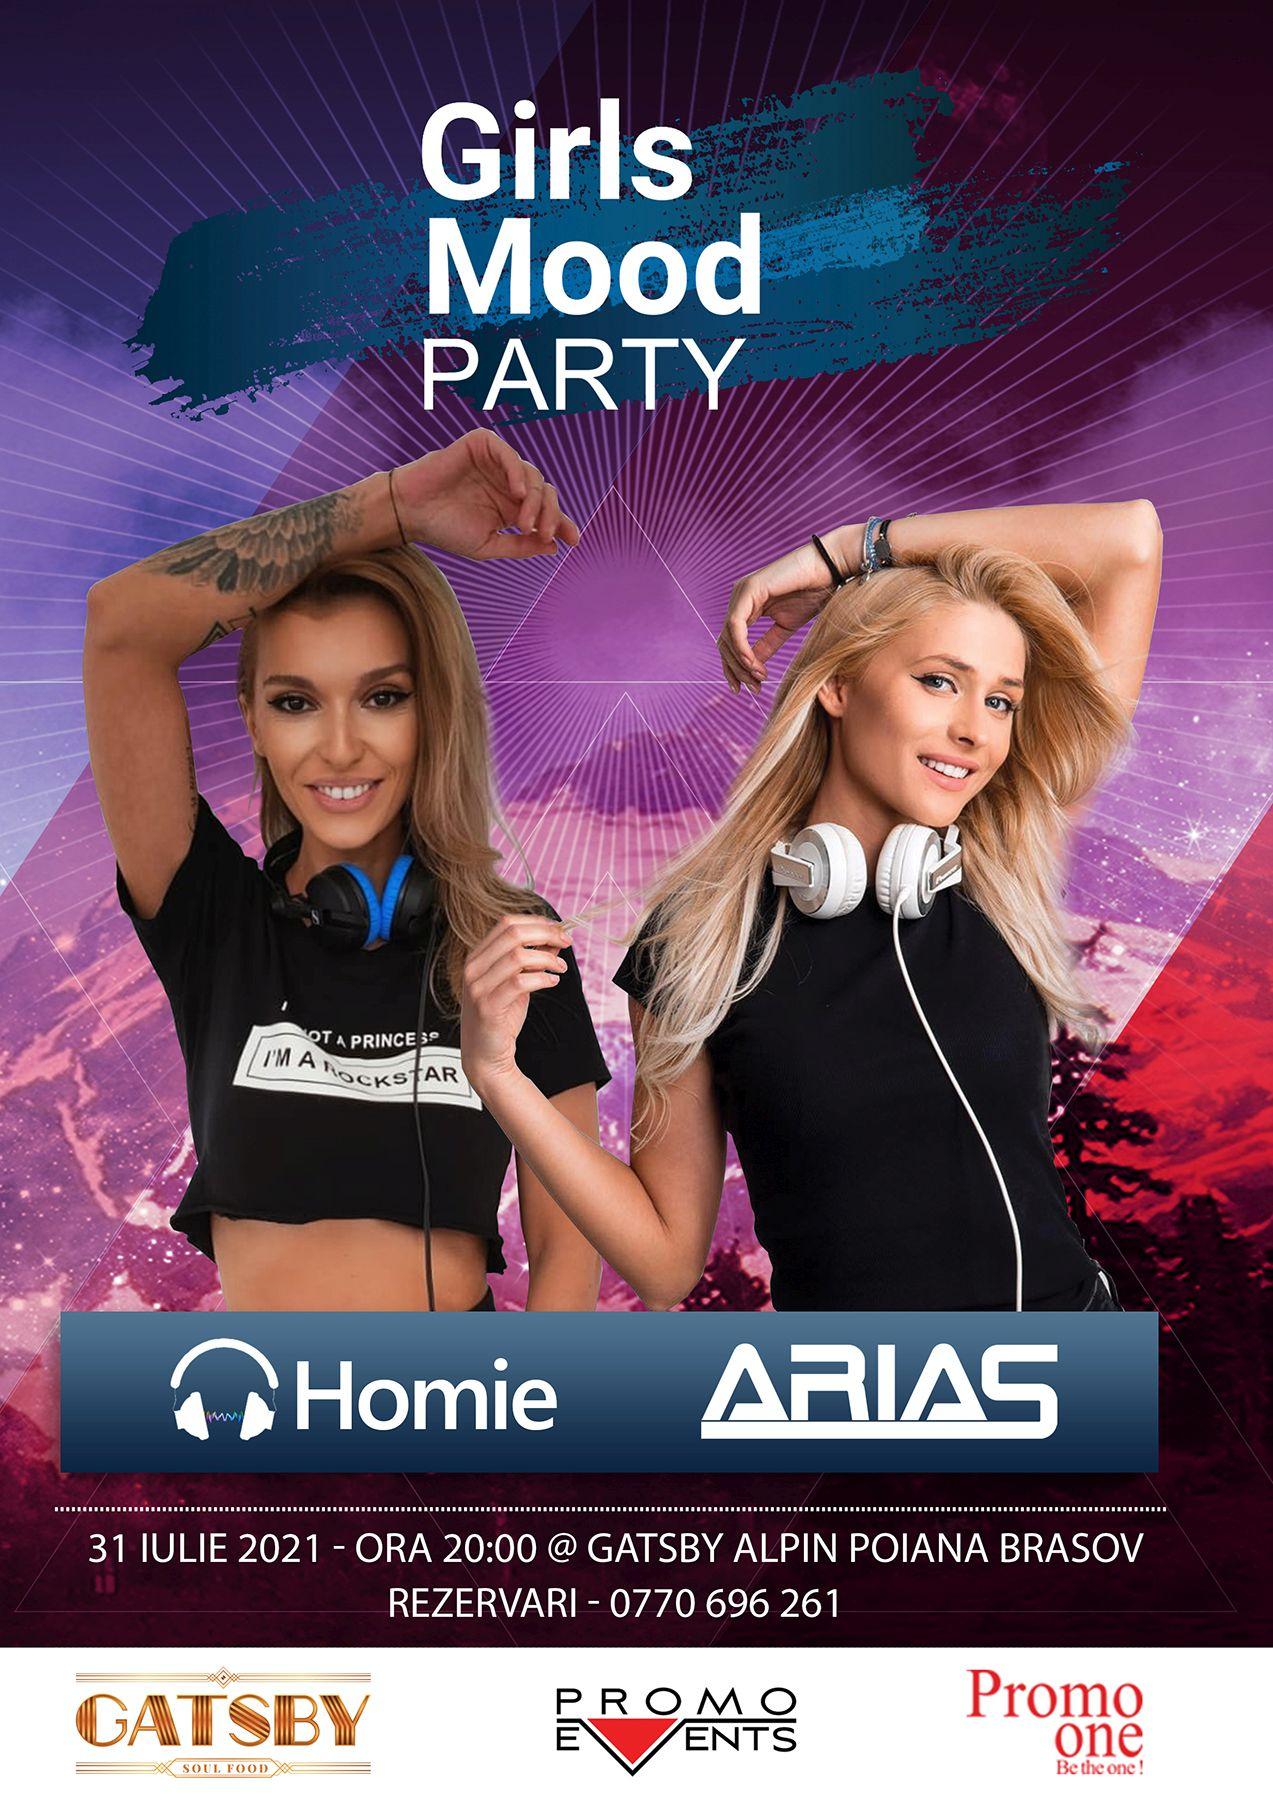 Girls Mood Party @ Gatsby Alpin, Poiana Brașov – 31 iulie 2021